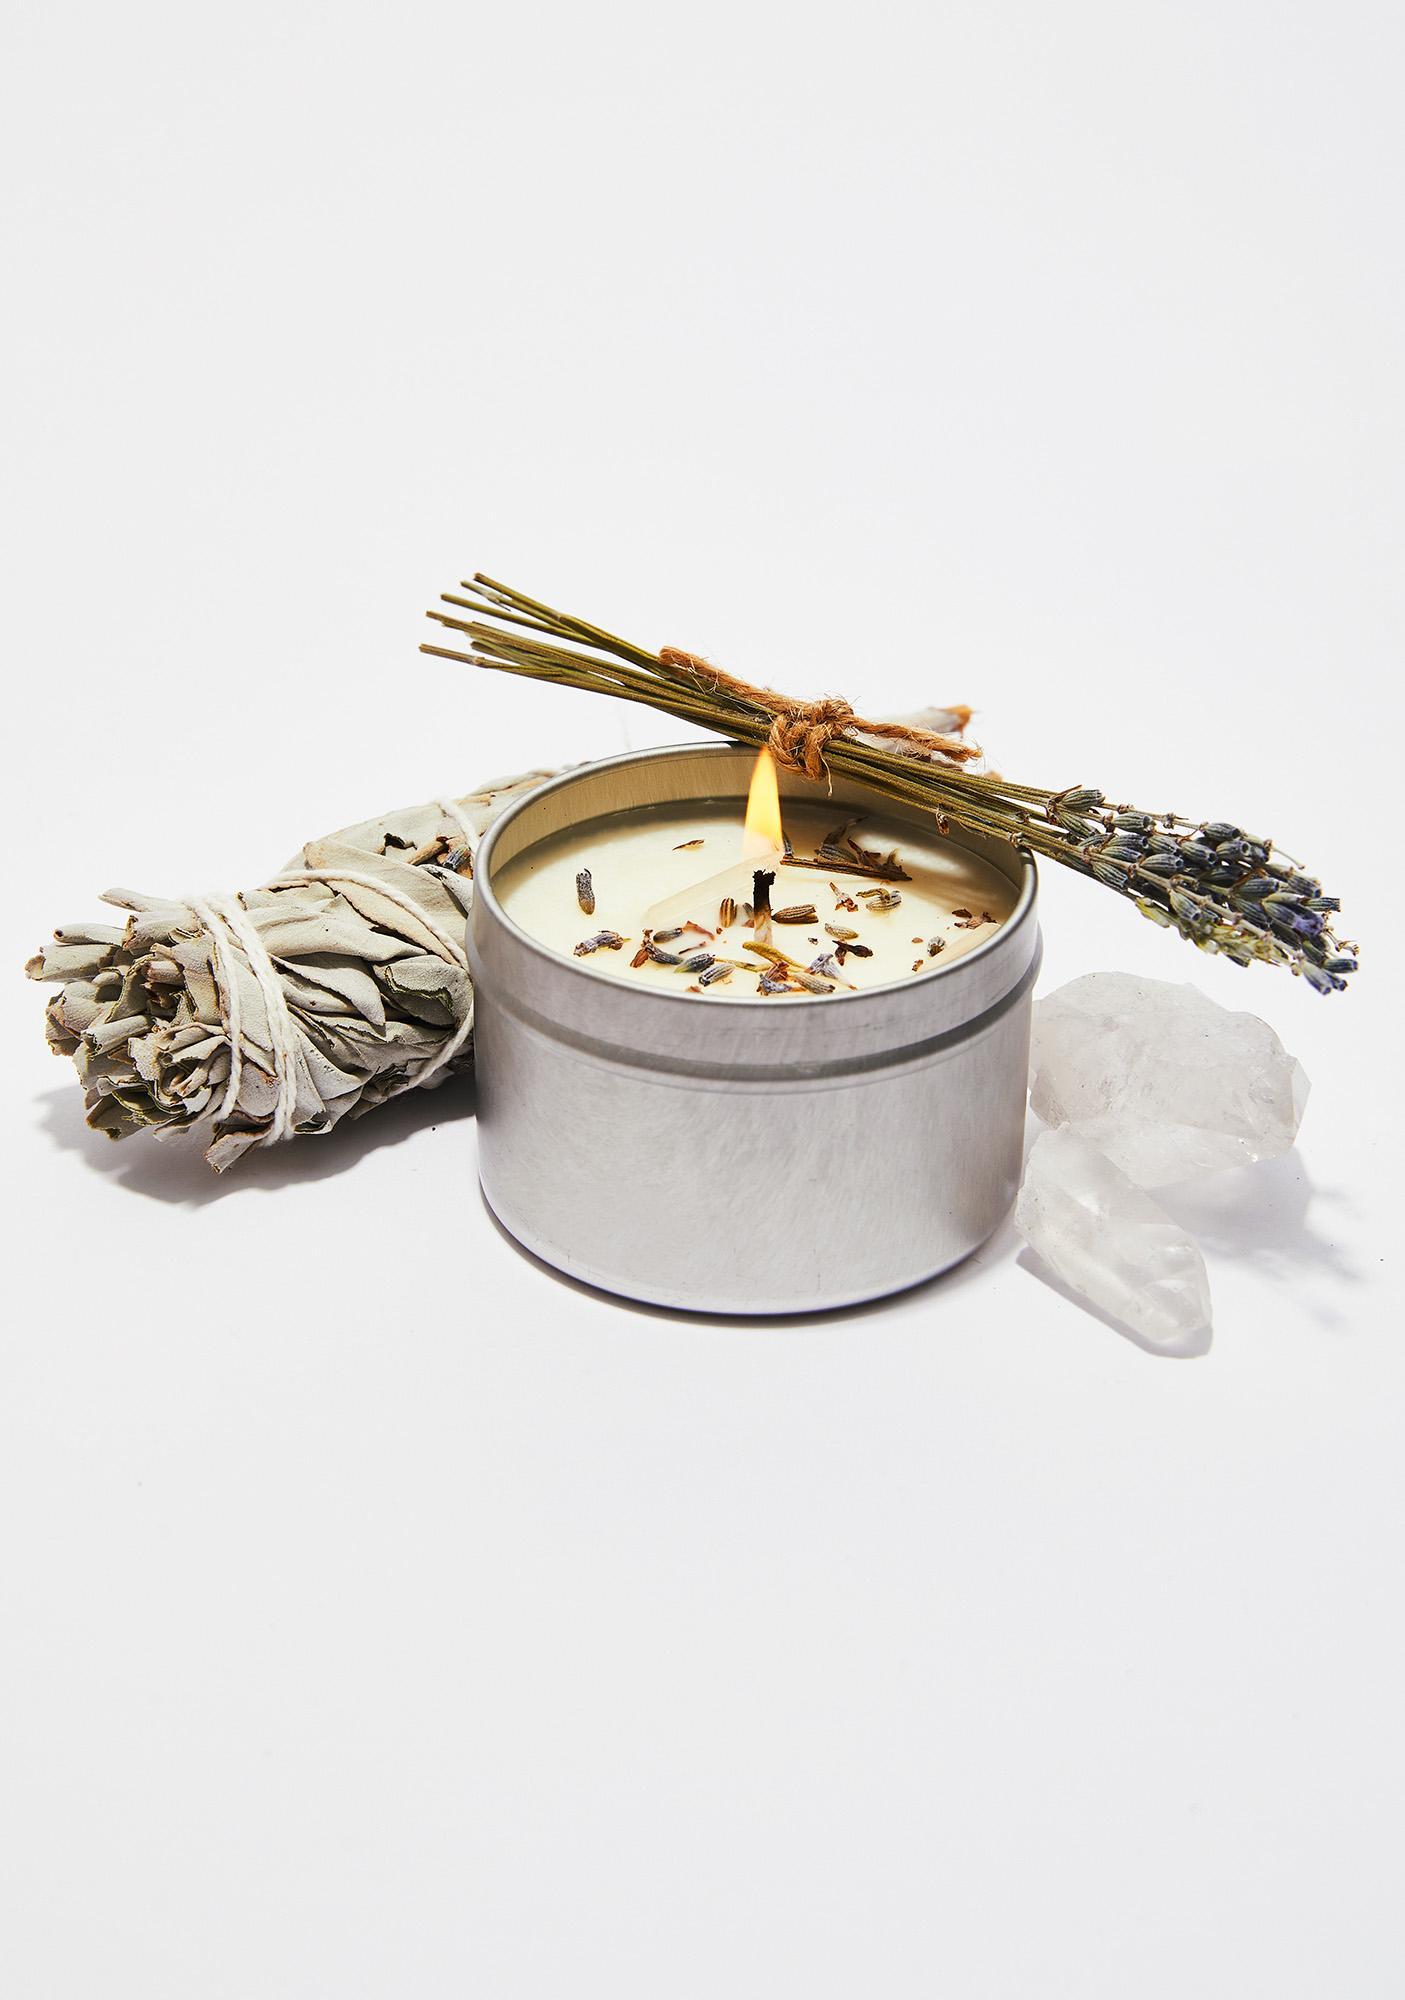 J. SOUTHERN STUDIO Lavender Ritual Candle